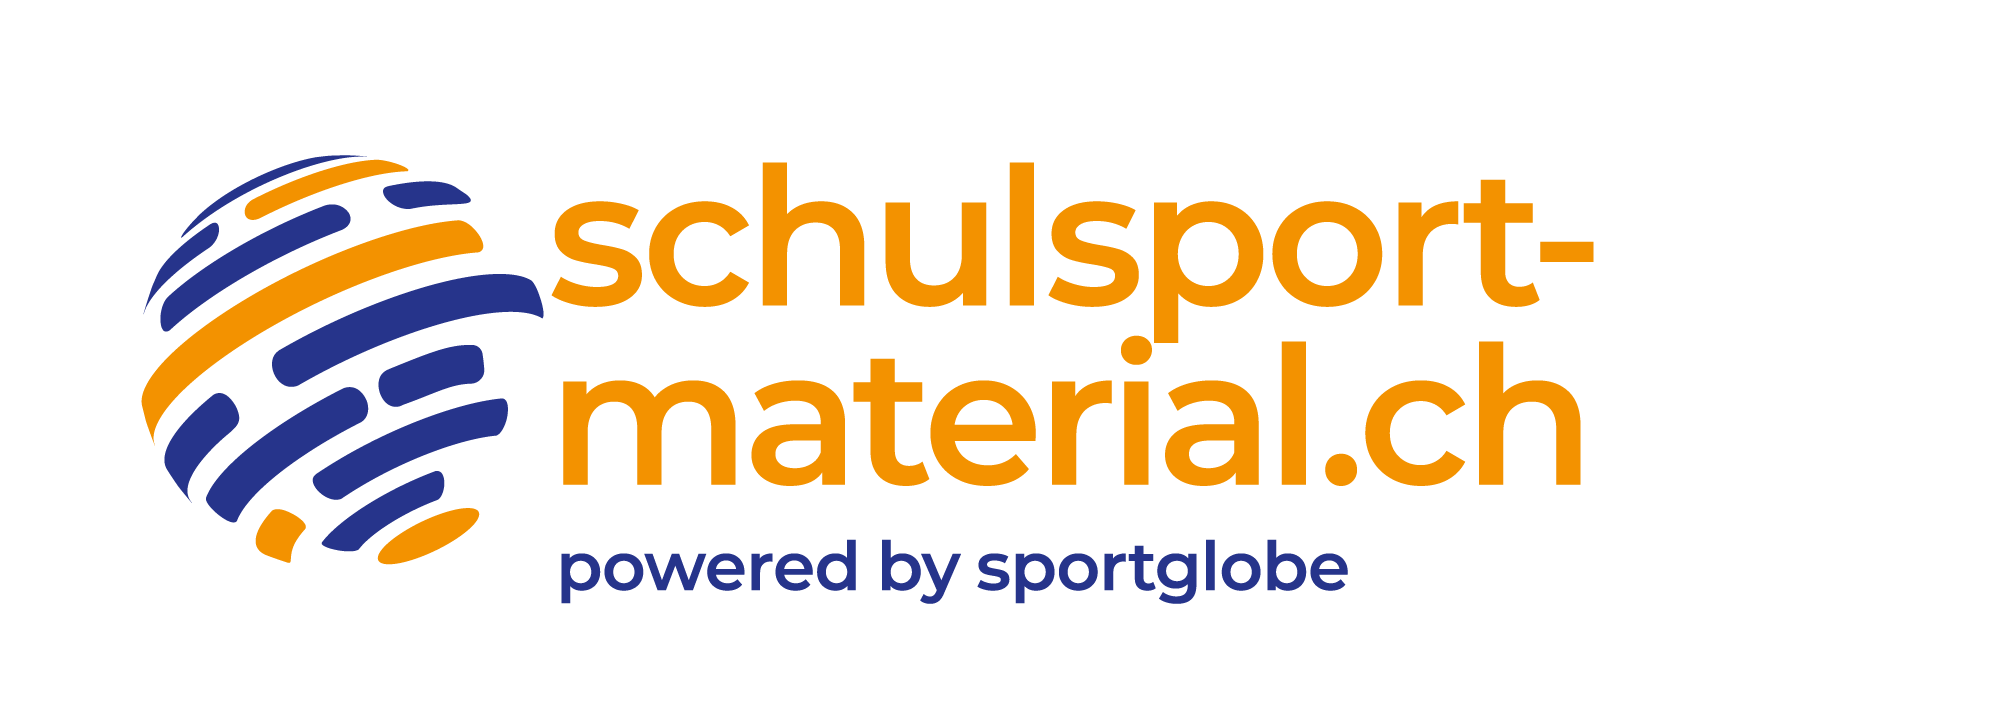 Sportglobe / Schulsport-Material